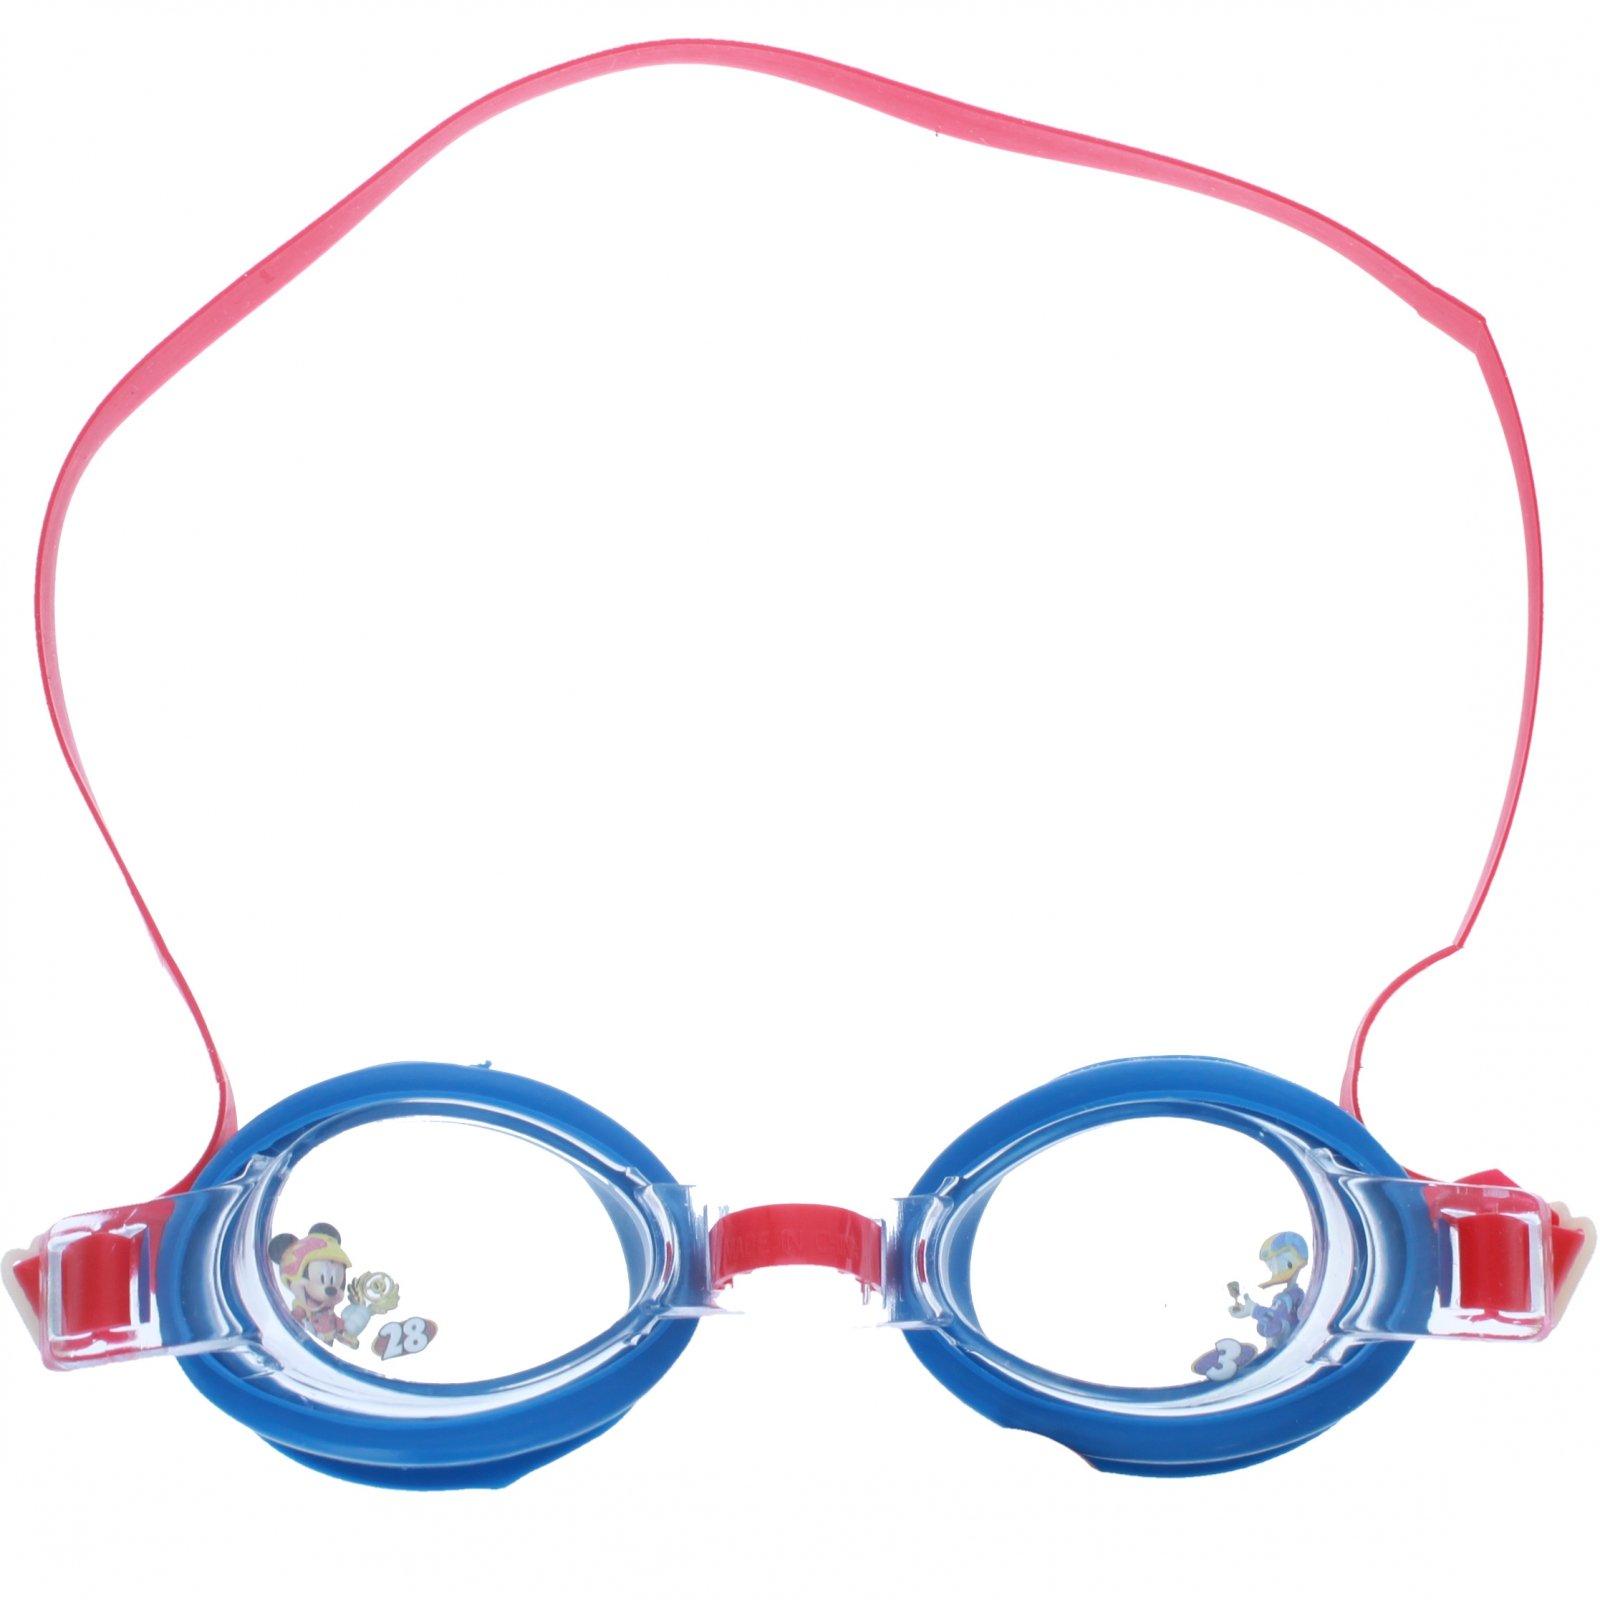 Disney Jr Mickey Mouse Swim Gear Splash Goggles Kids Summer Swim Accessories